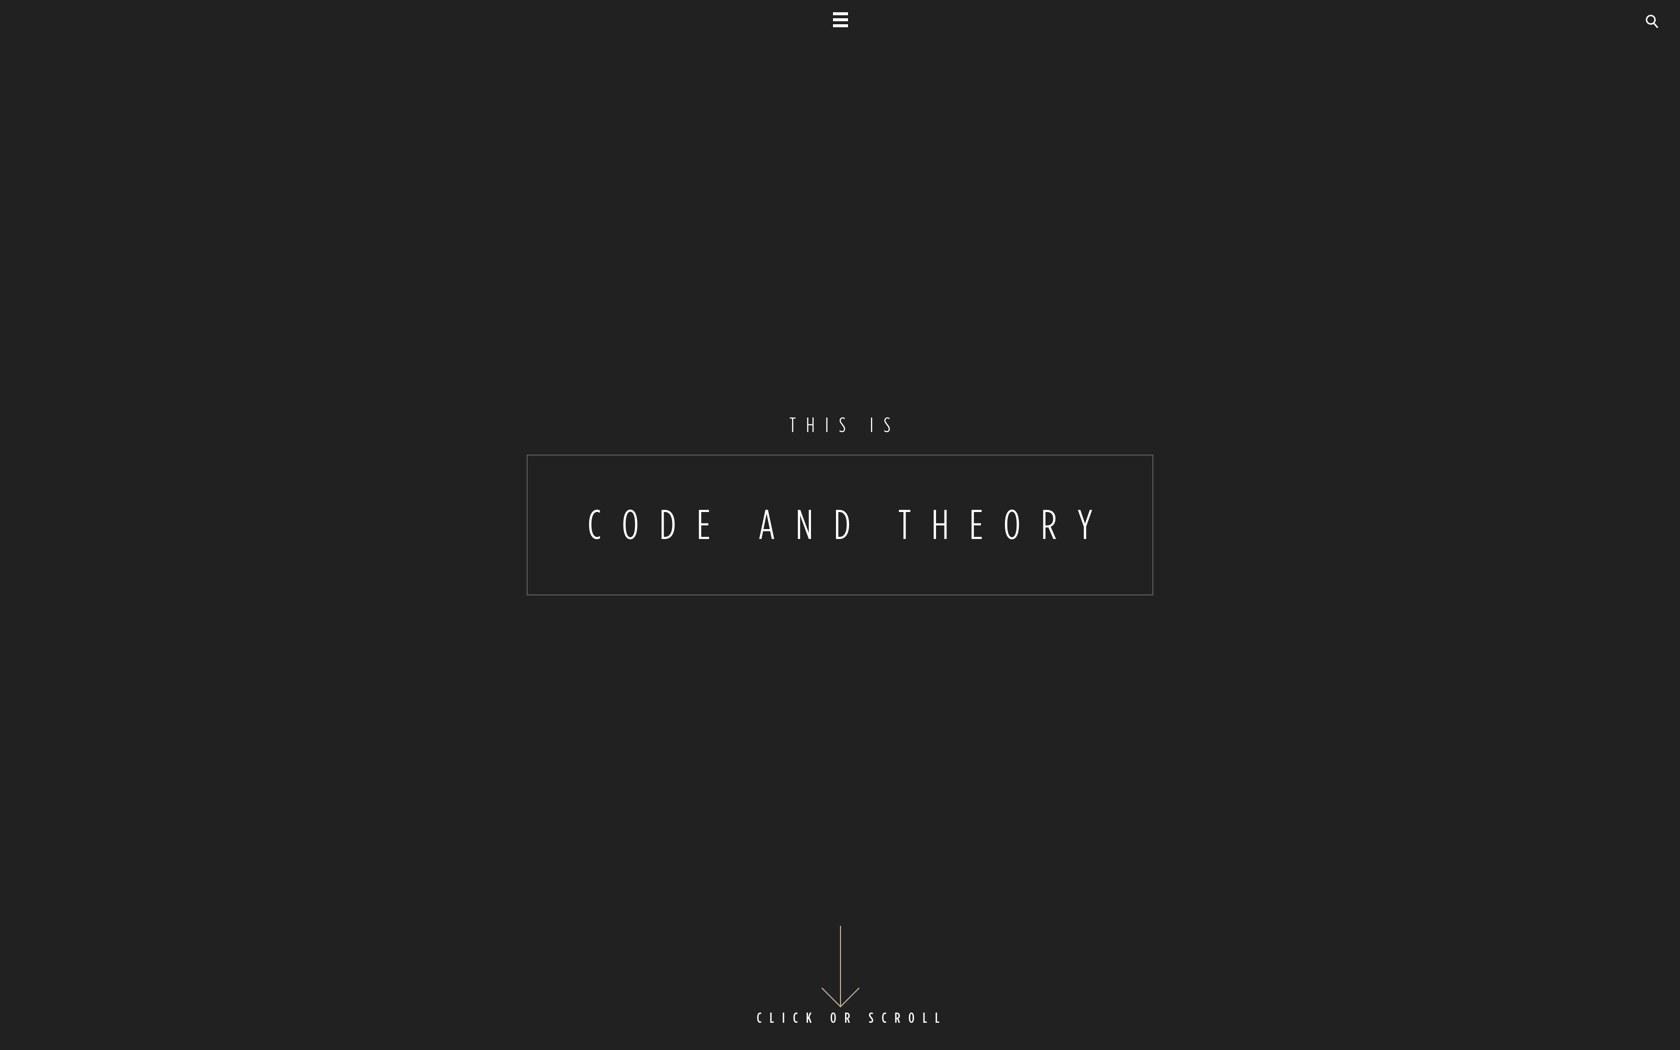 Codeandtheory 02